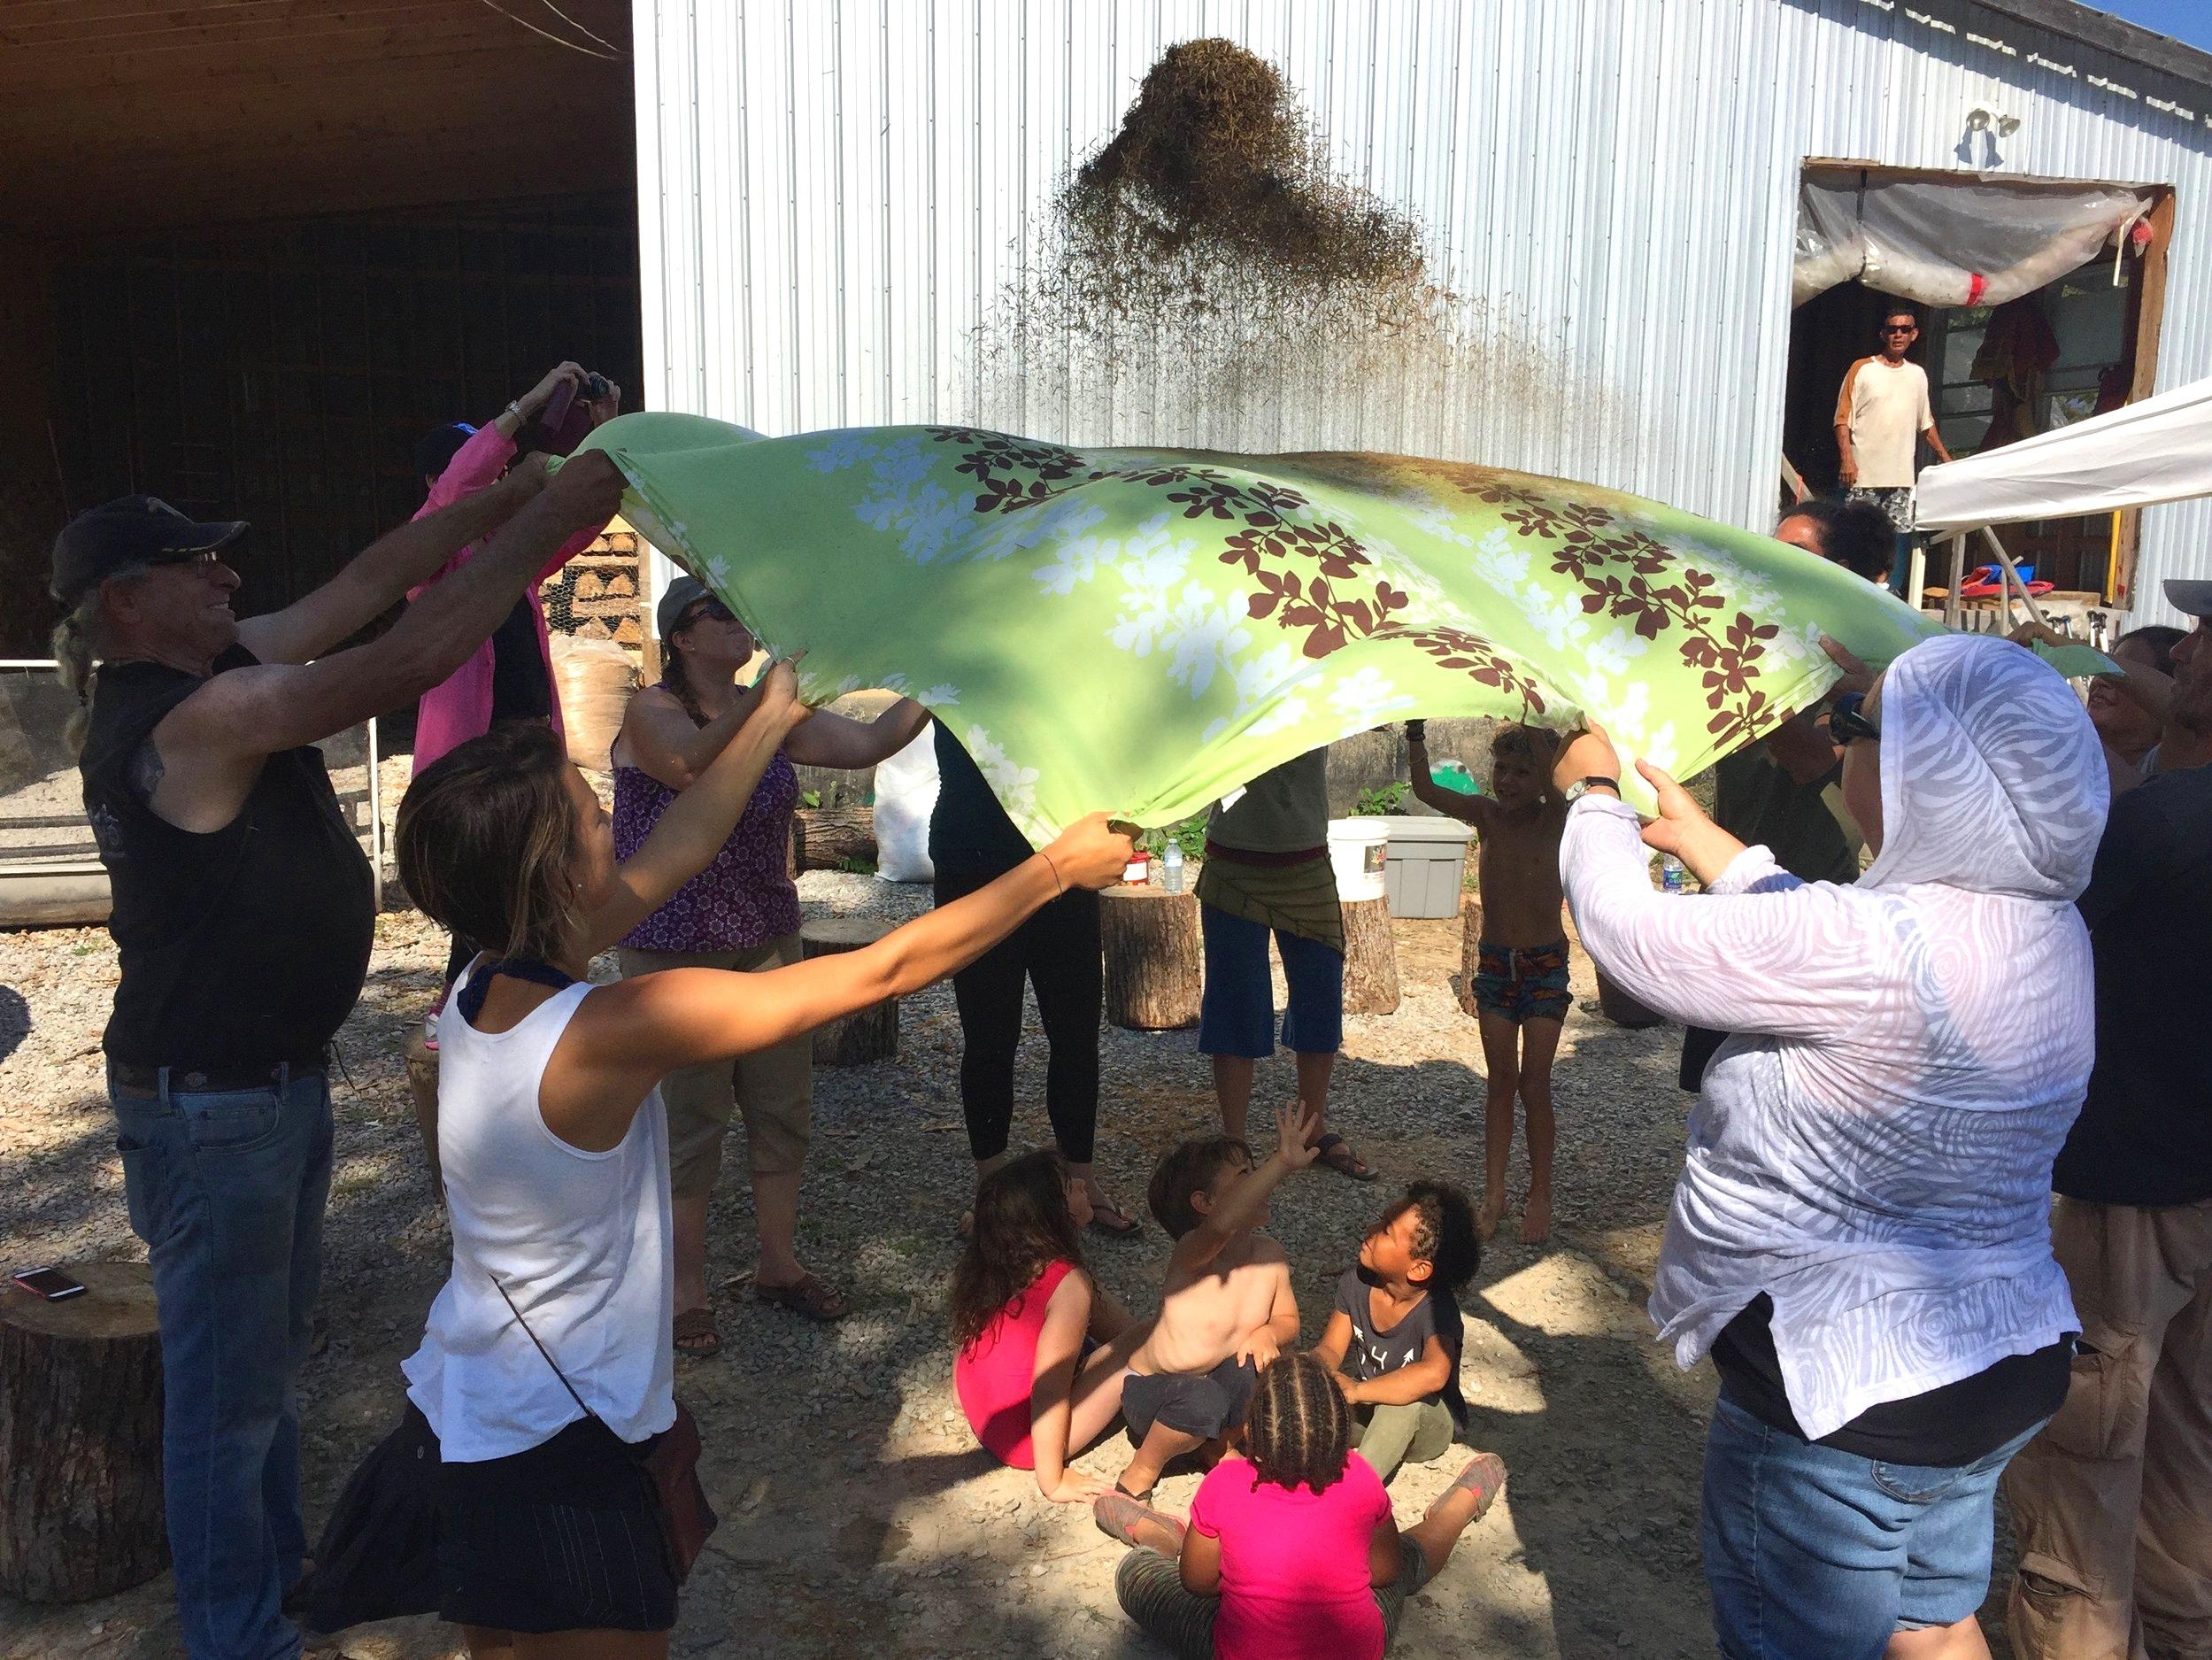 BLACK DUCK WILD RICE - Indigenous food sovereignty within the Kawartha Lake Region